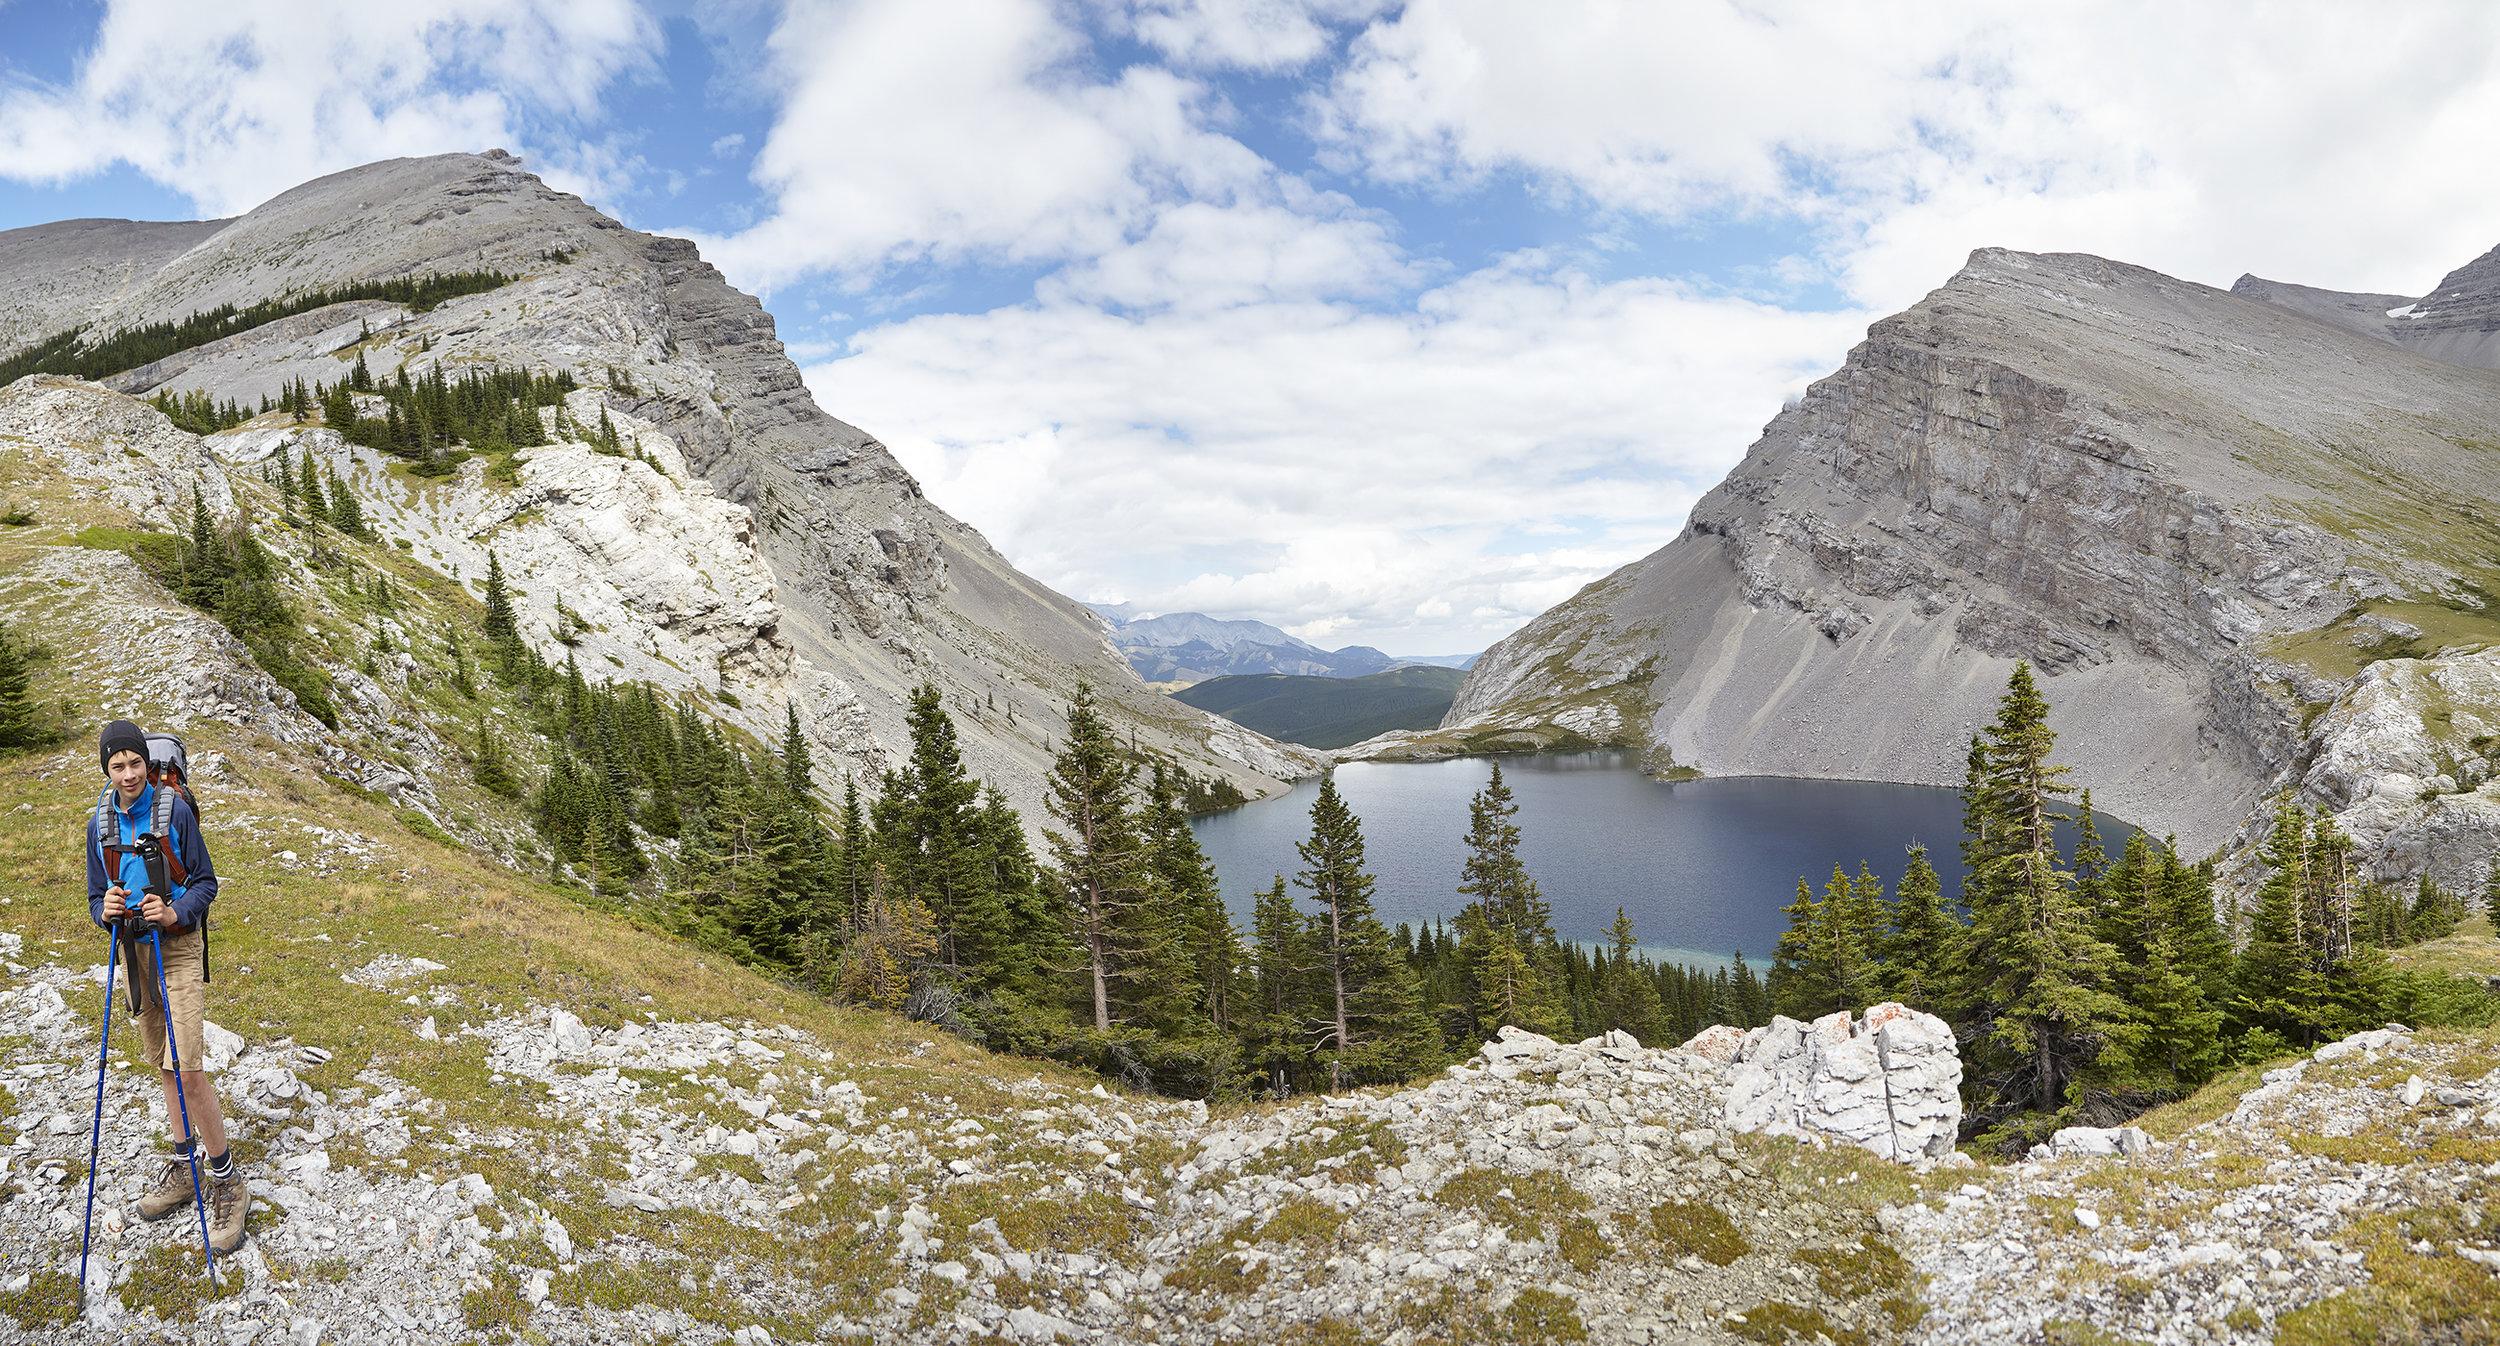 A panorama of Mount Strachan, Carnarvon Lake, and Mount MacLaren.